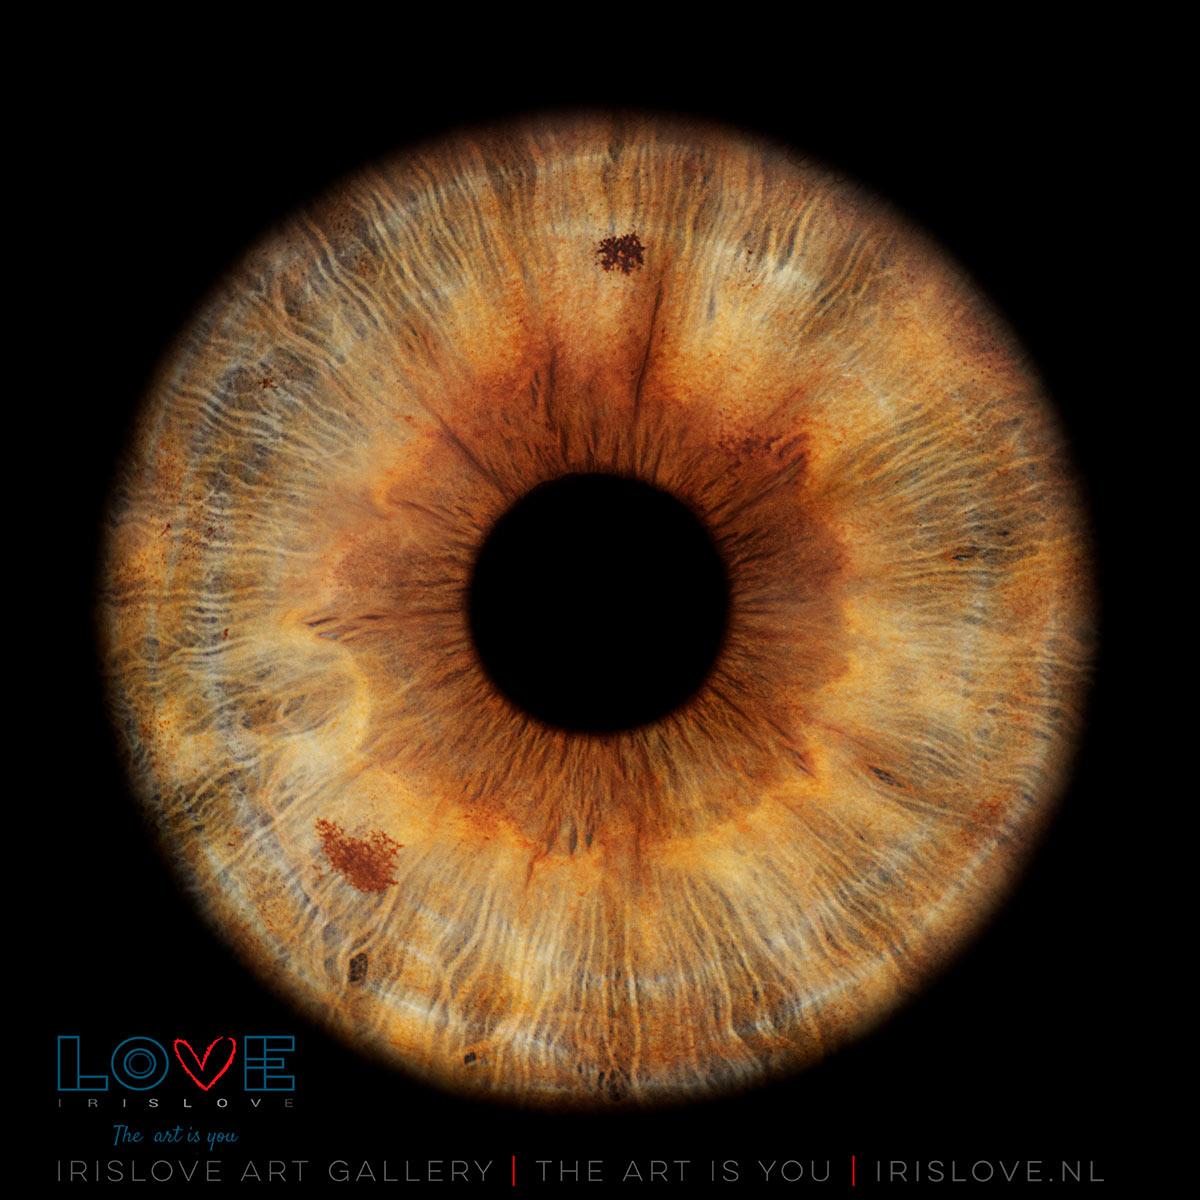 Zeldzame oogkleur